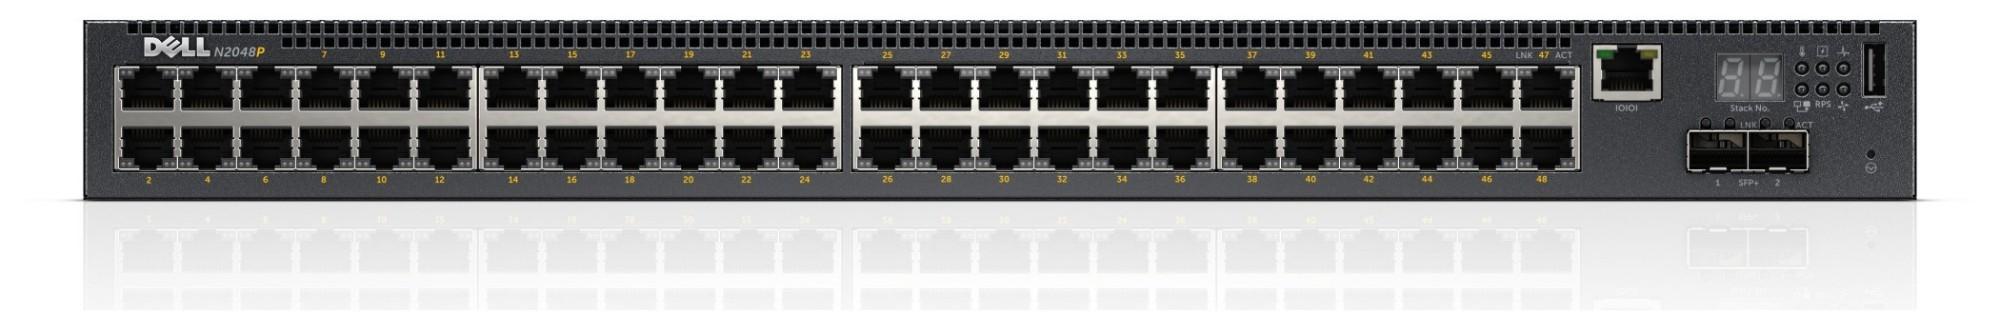 DELL PowerConnect N2048P Managed network switch L2+ Gigabit Ethernet (10/100/1000) Power over Ethernet (PoE) 1U Black